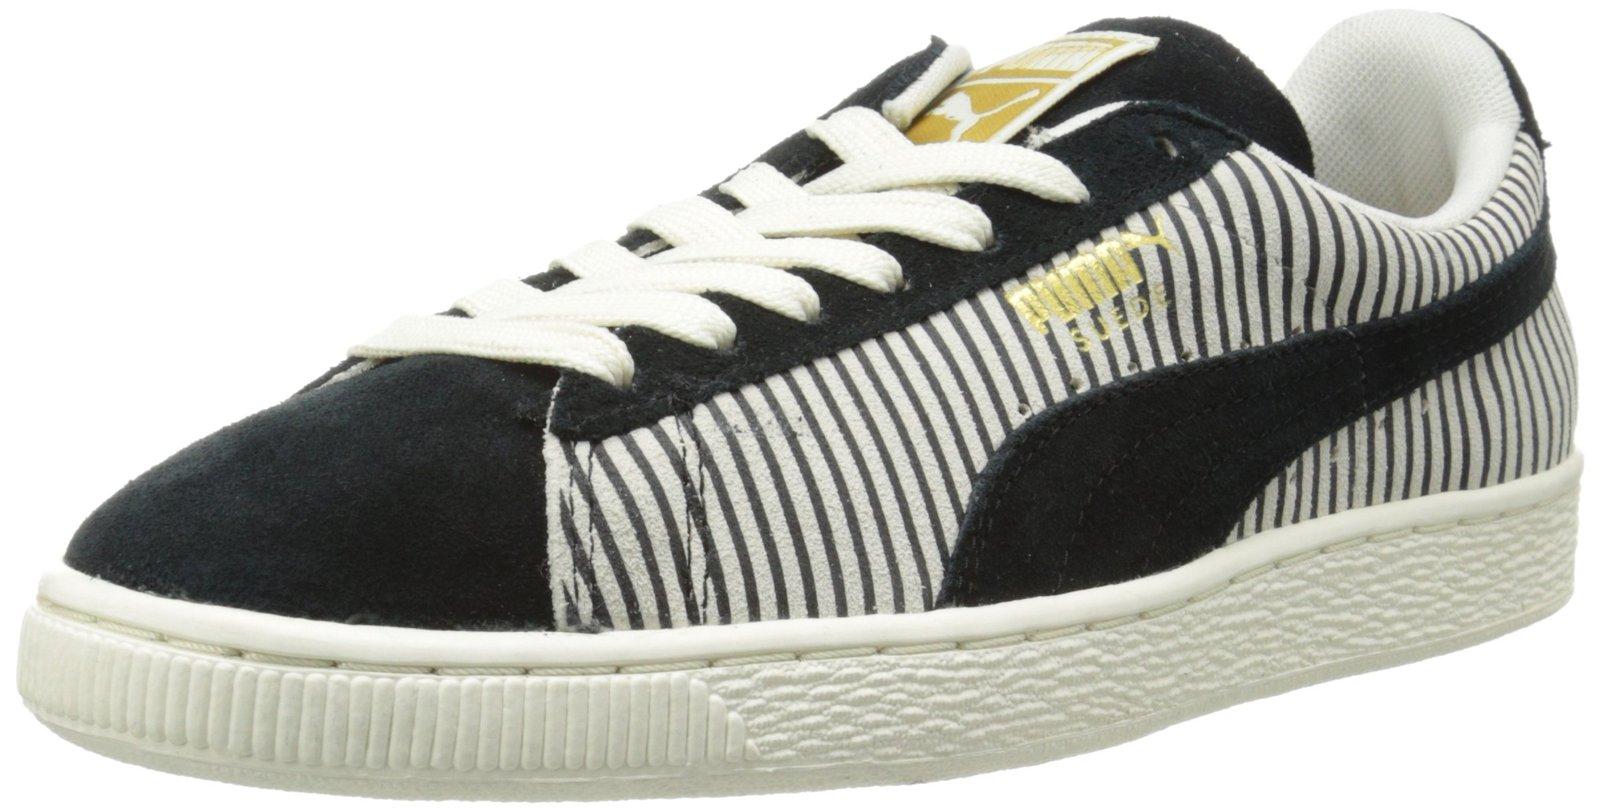 Puma Gold Pink Black White Eco Ortholite Sneakers Size US 6.5 Regular (M, B)